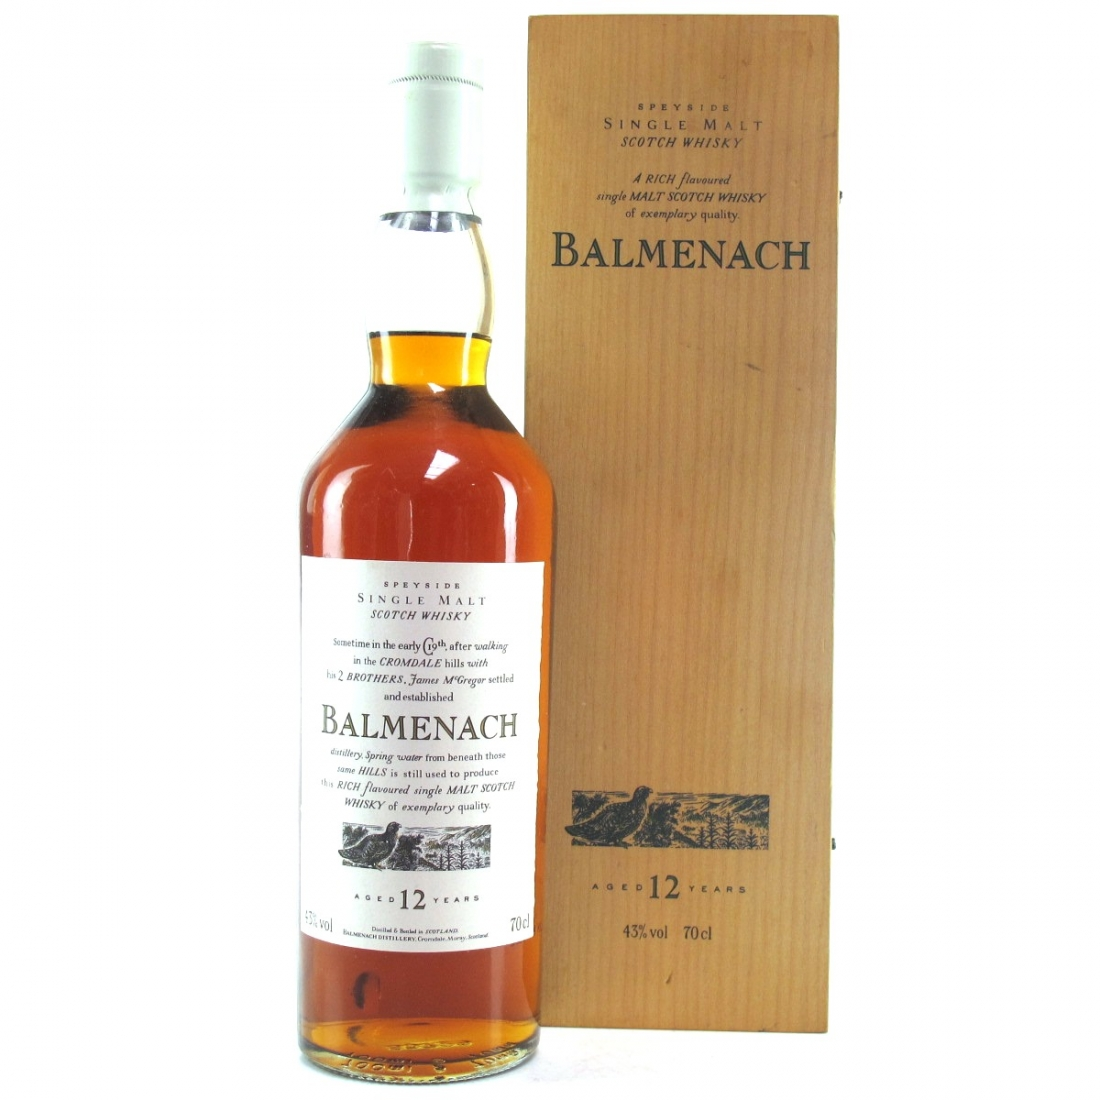 Balmenach 12 Year Old Flora and Fauna / Wooden Box White Cap